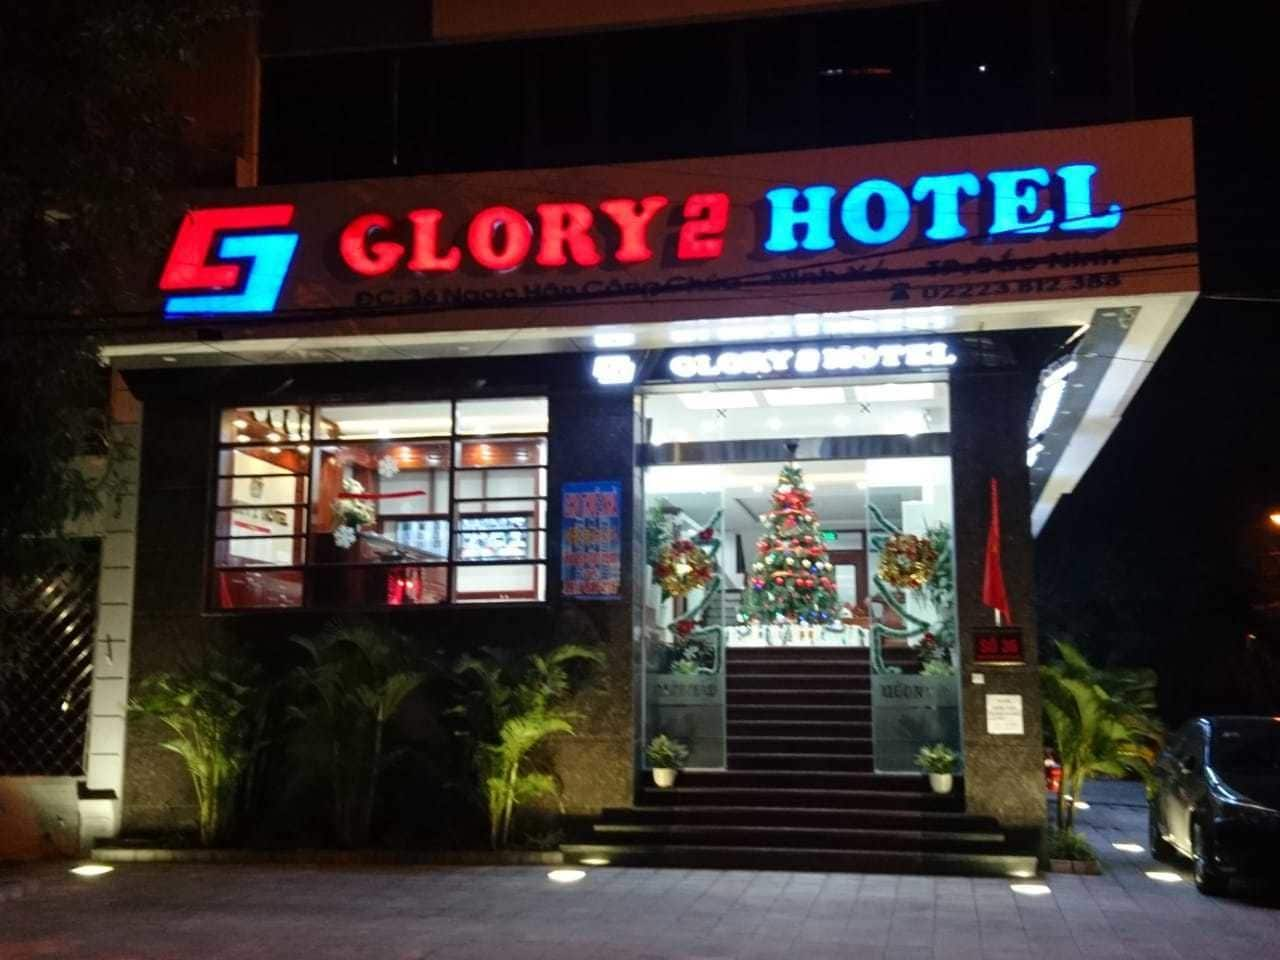 Glory 2 Hotel, Bắc Ninh